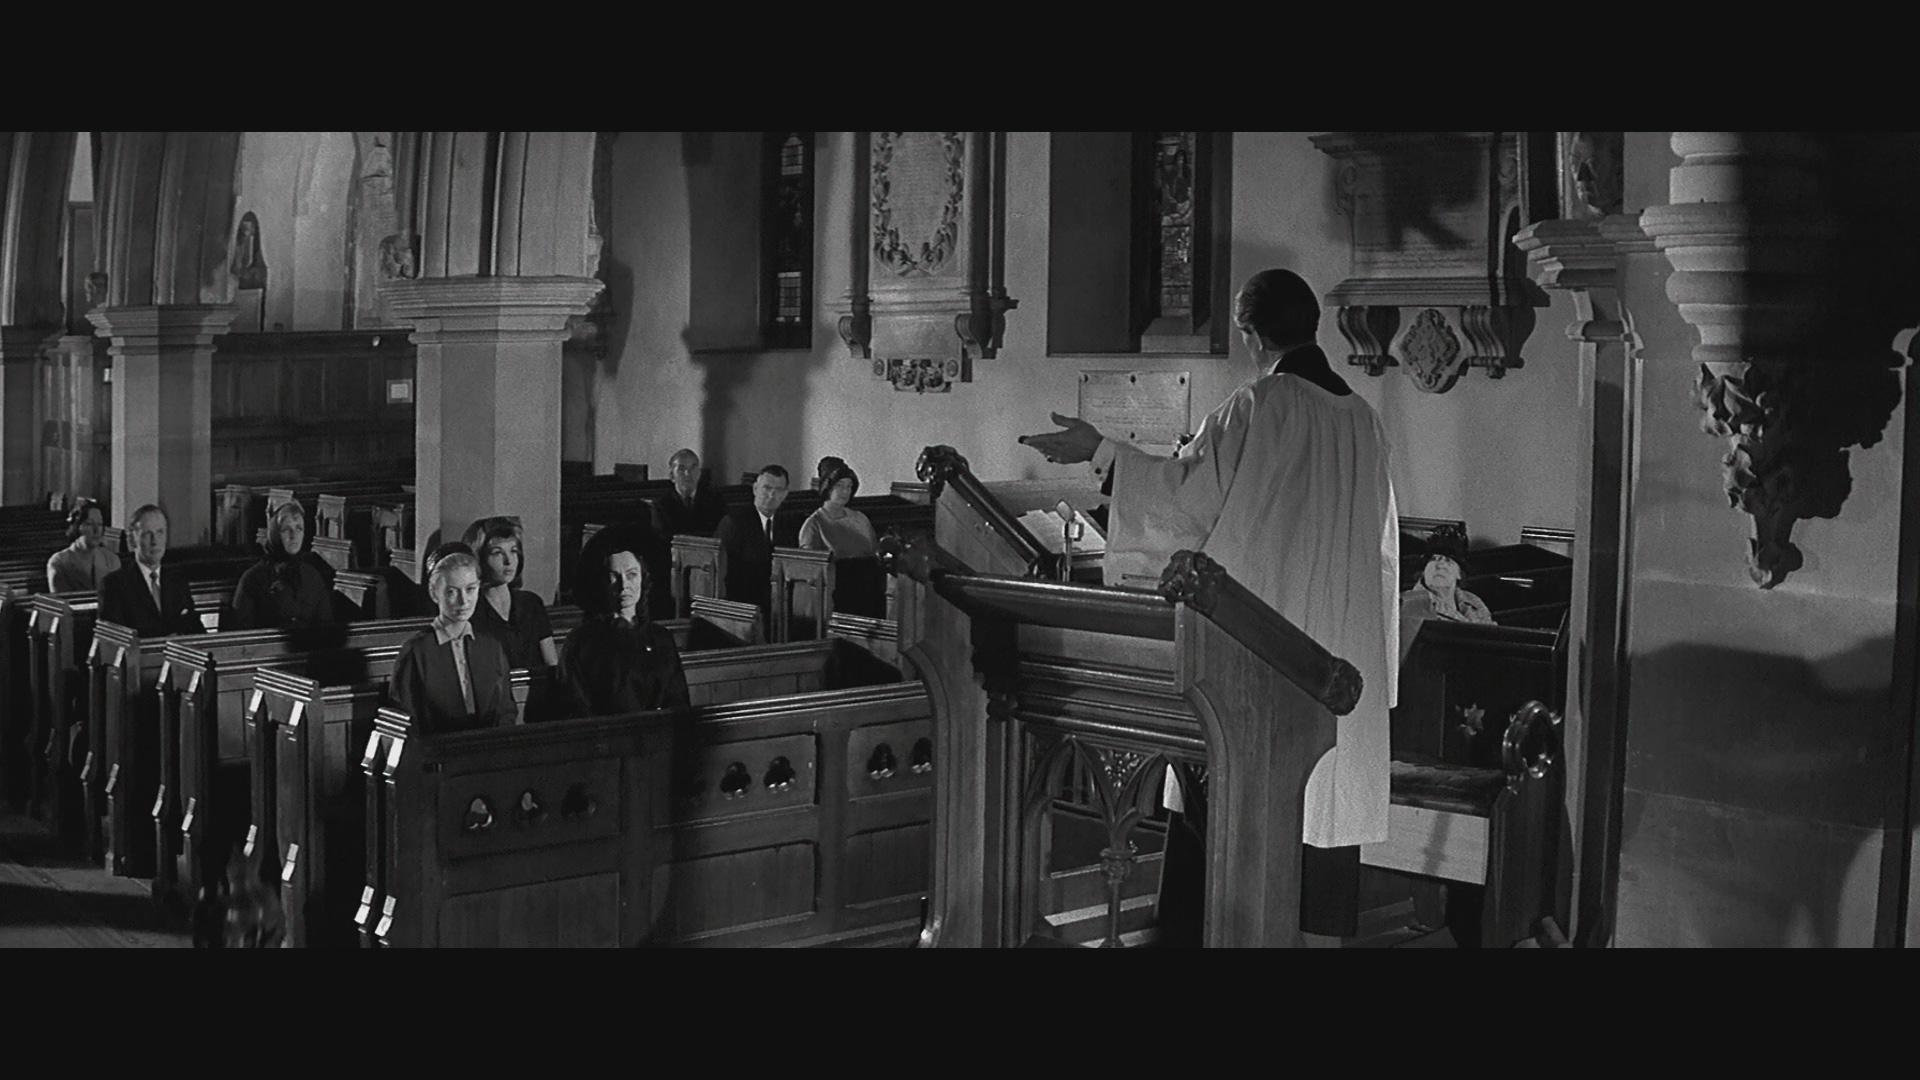 Liliane Brousse, Sheila Burrell, Janette Scott, and Colin Tapley in Paranoiac (1963)